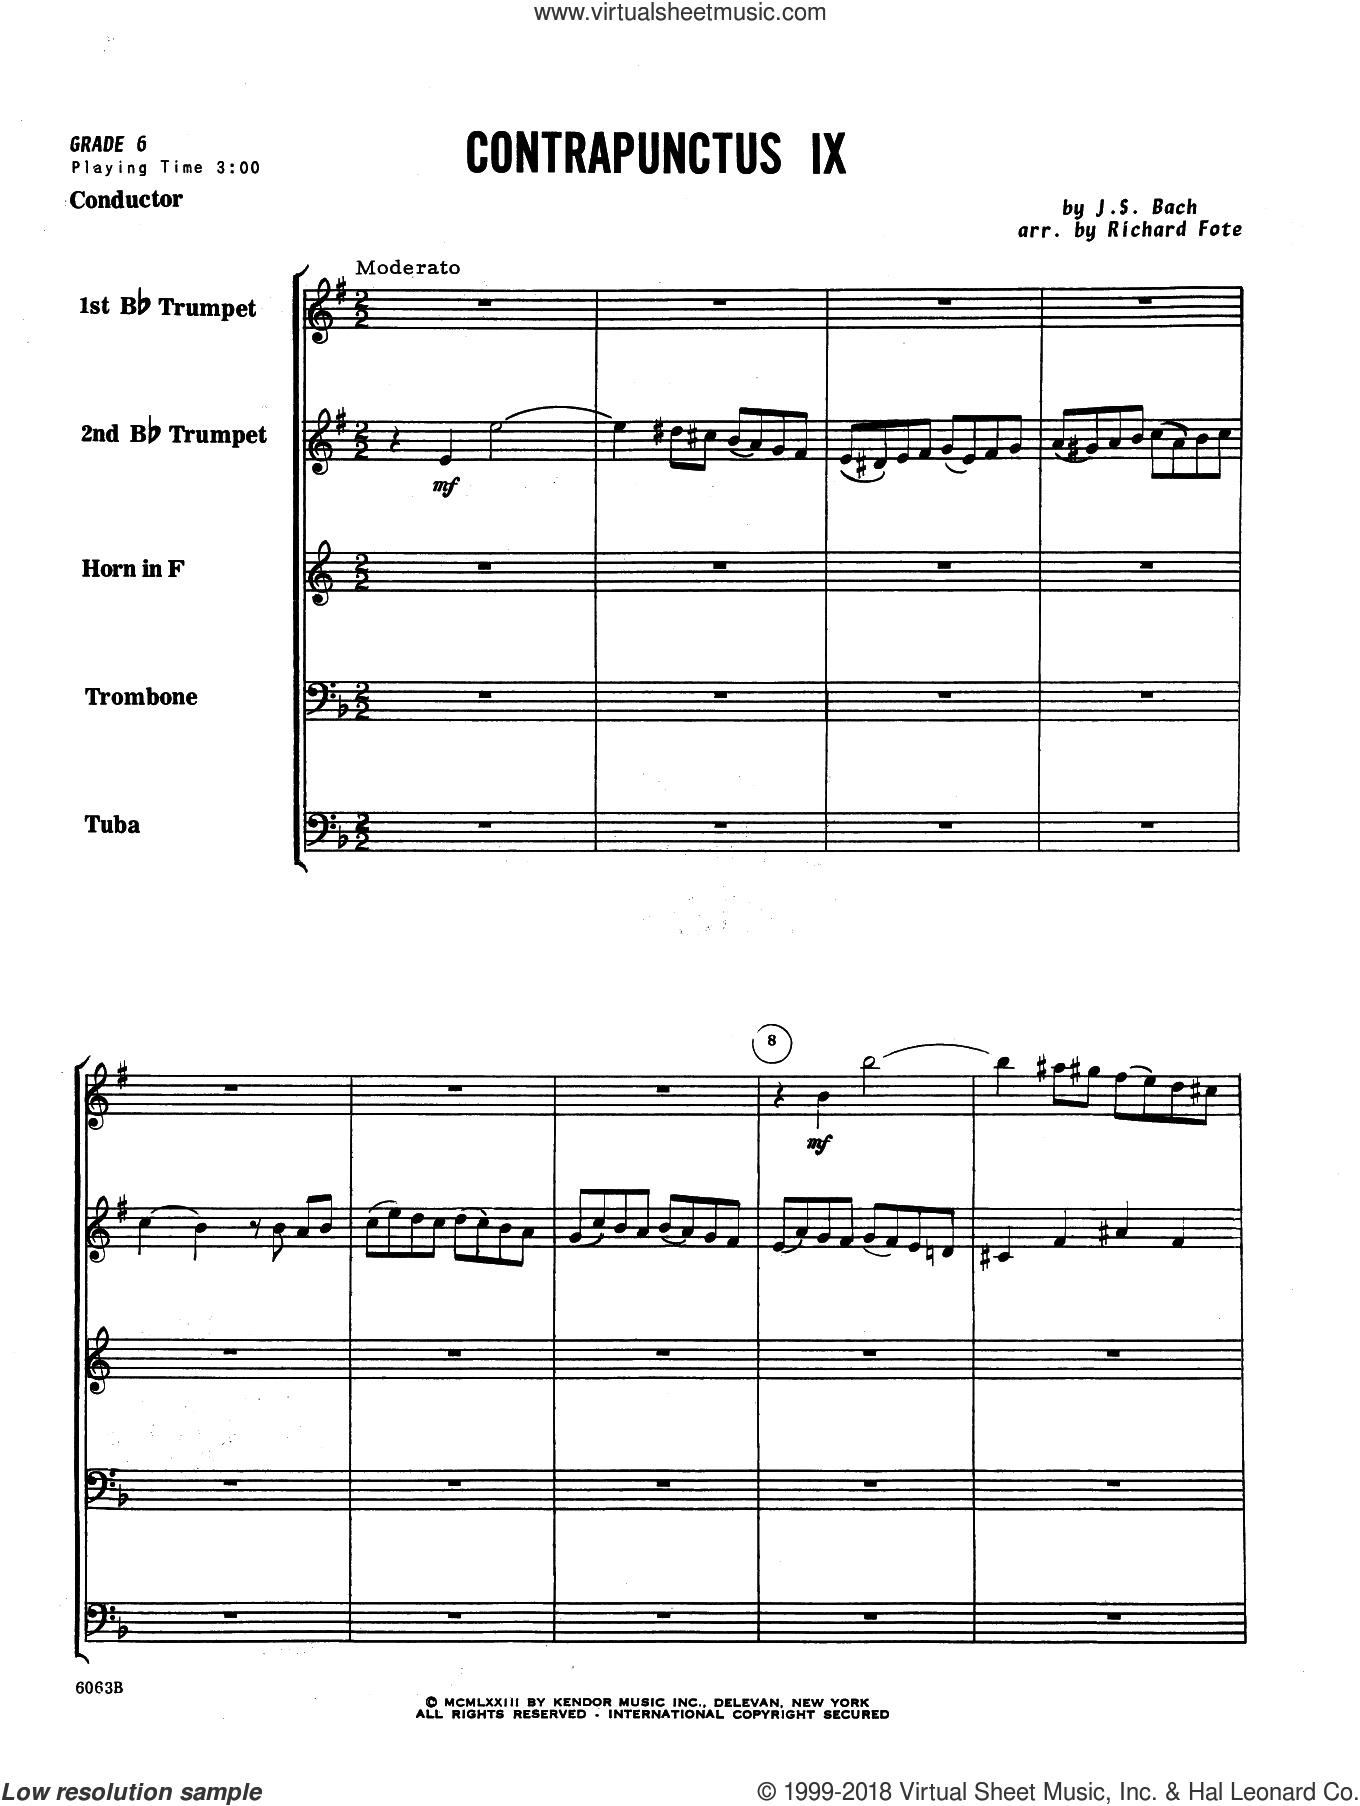 Contrapunctus IX (arr. Richard Fote) (COMPLETE) sheet music for brass quintet by Johann Sebastian Bach and Richard Fote, classical score, intermediate skill level